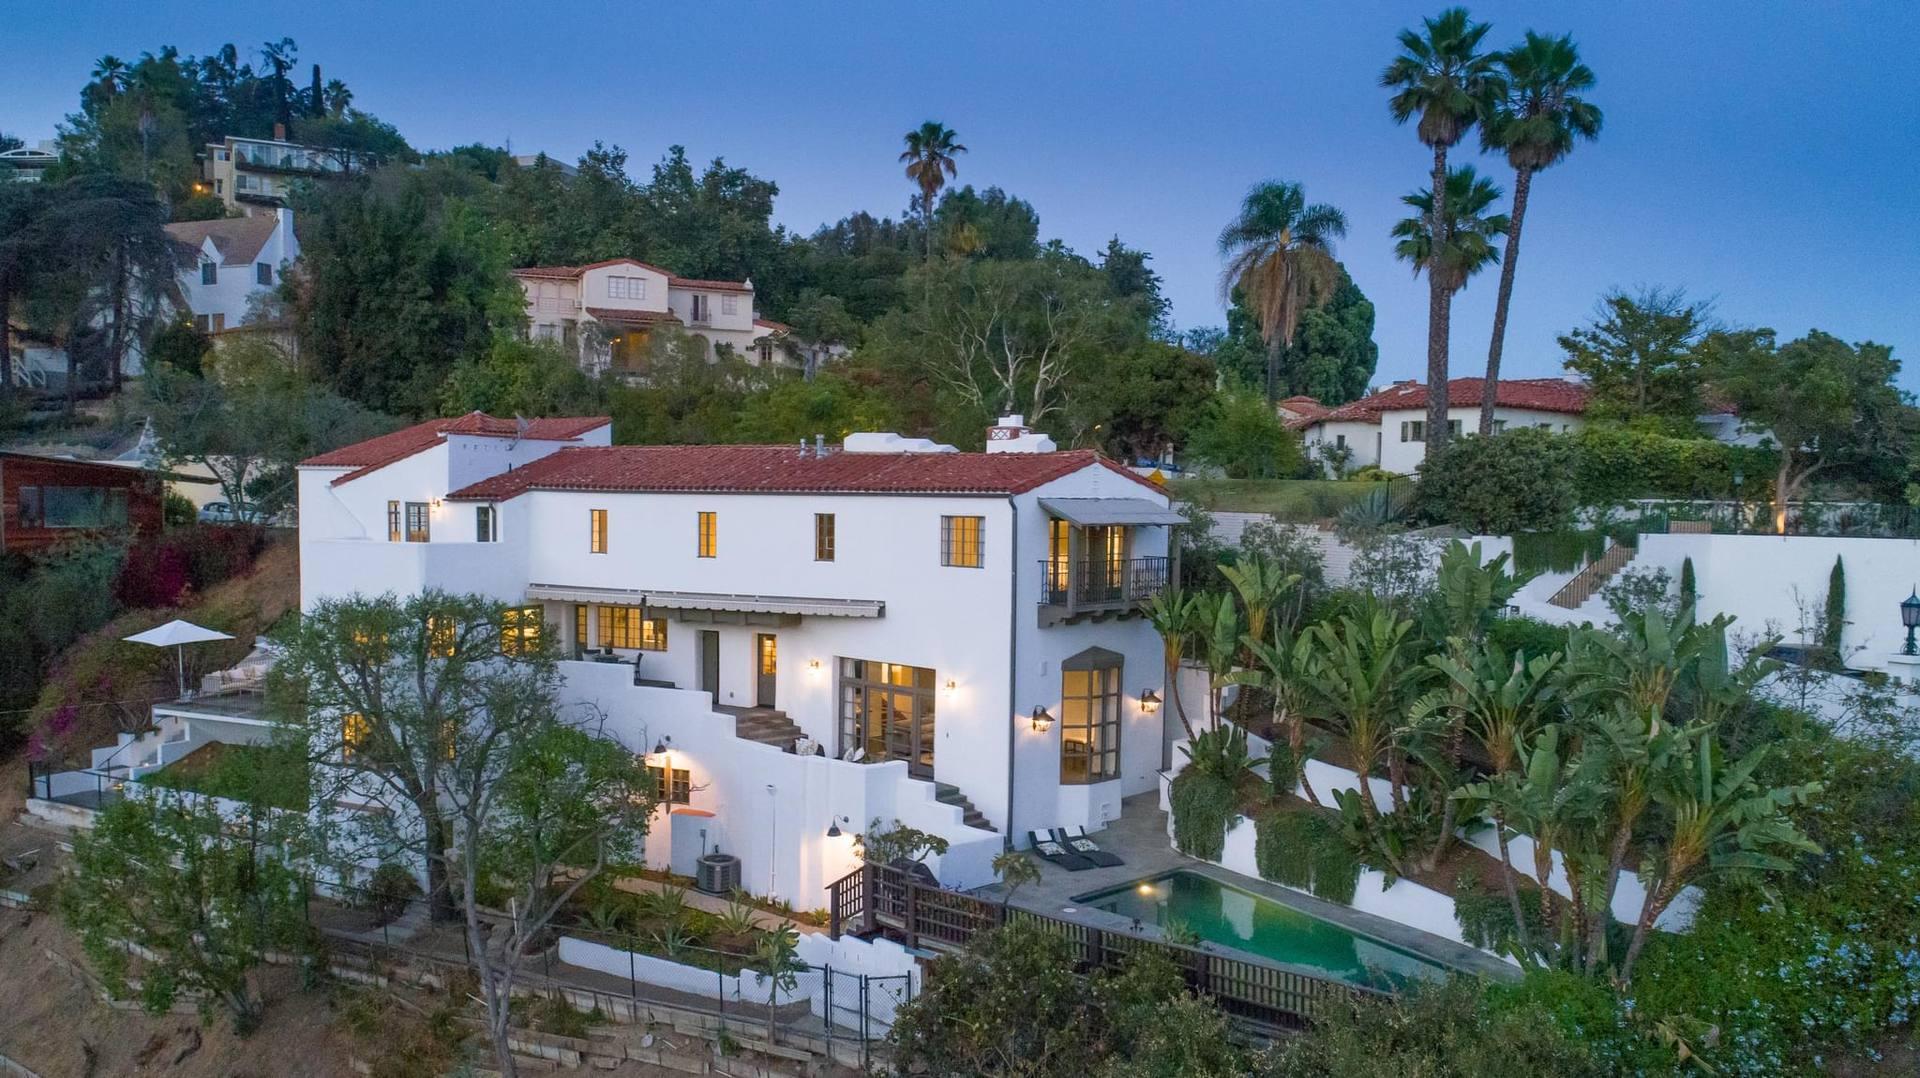 2501 N Catalina St 2501 N Catalina St., Los Angeles, CA 90027, US